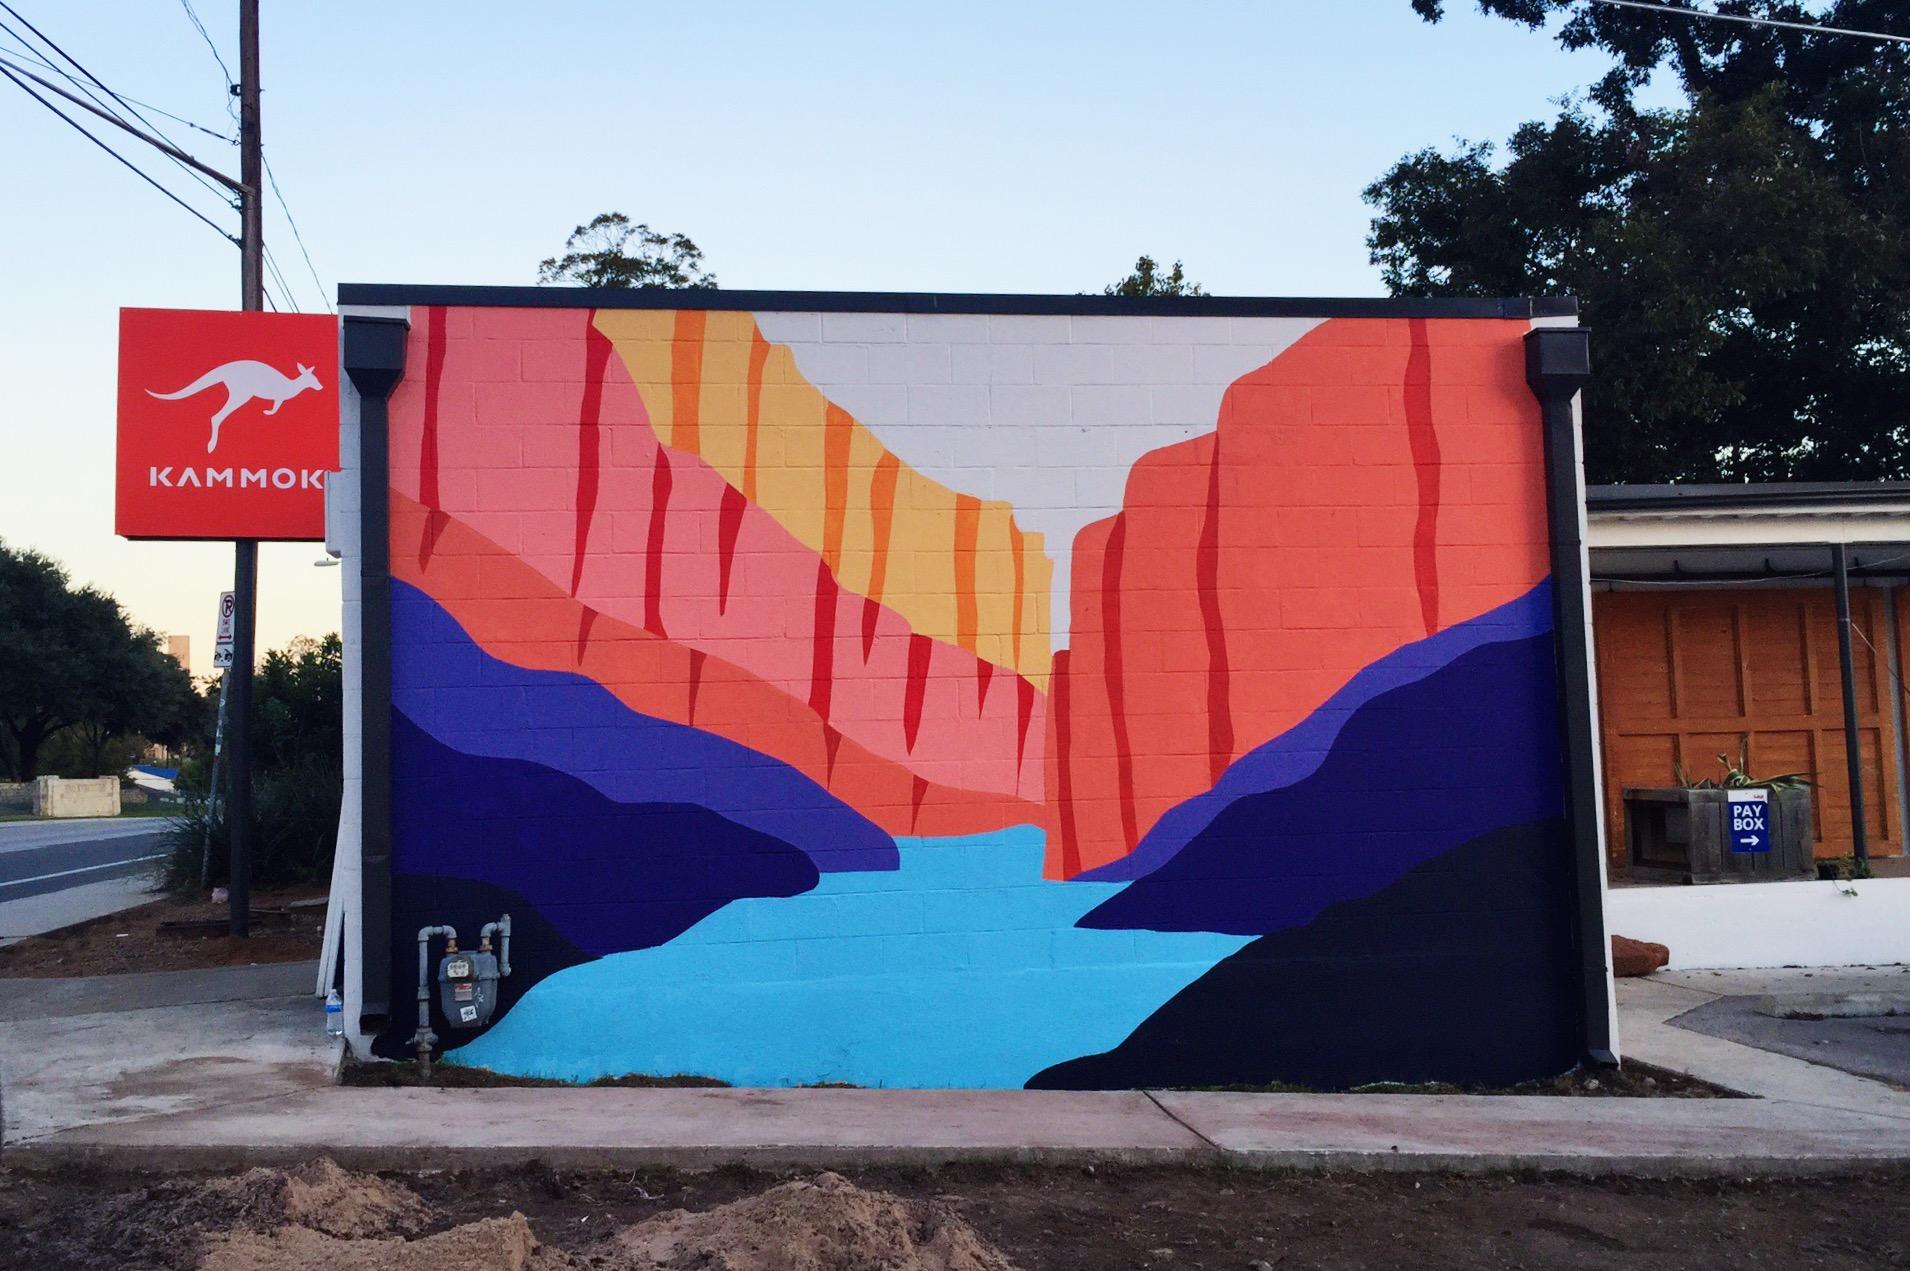 Austin+Kammok+Mural.jpeg